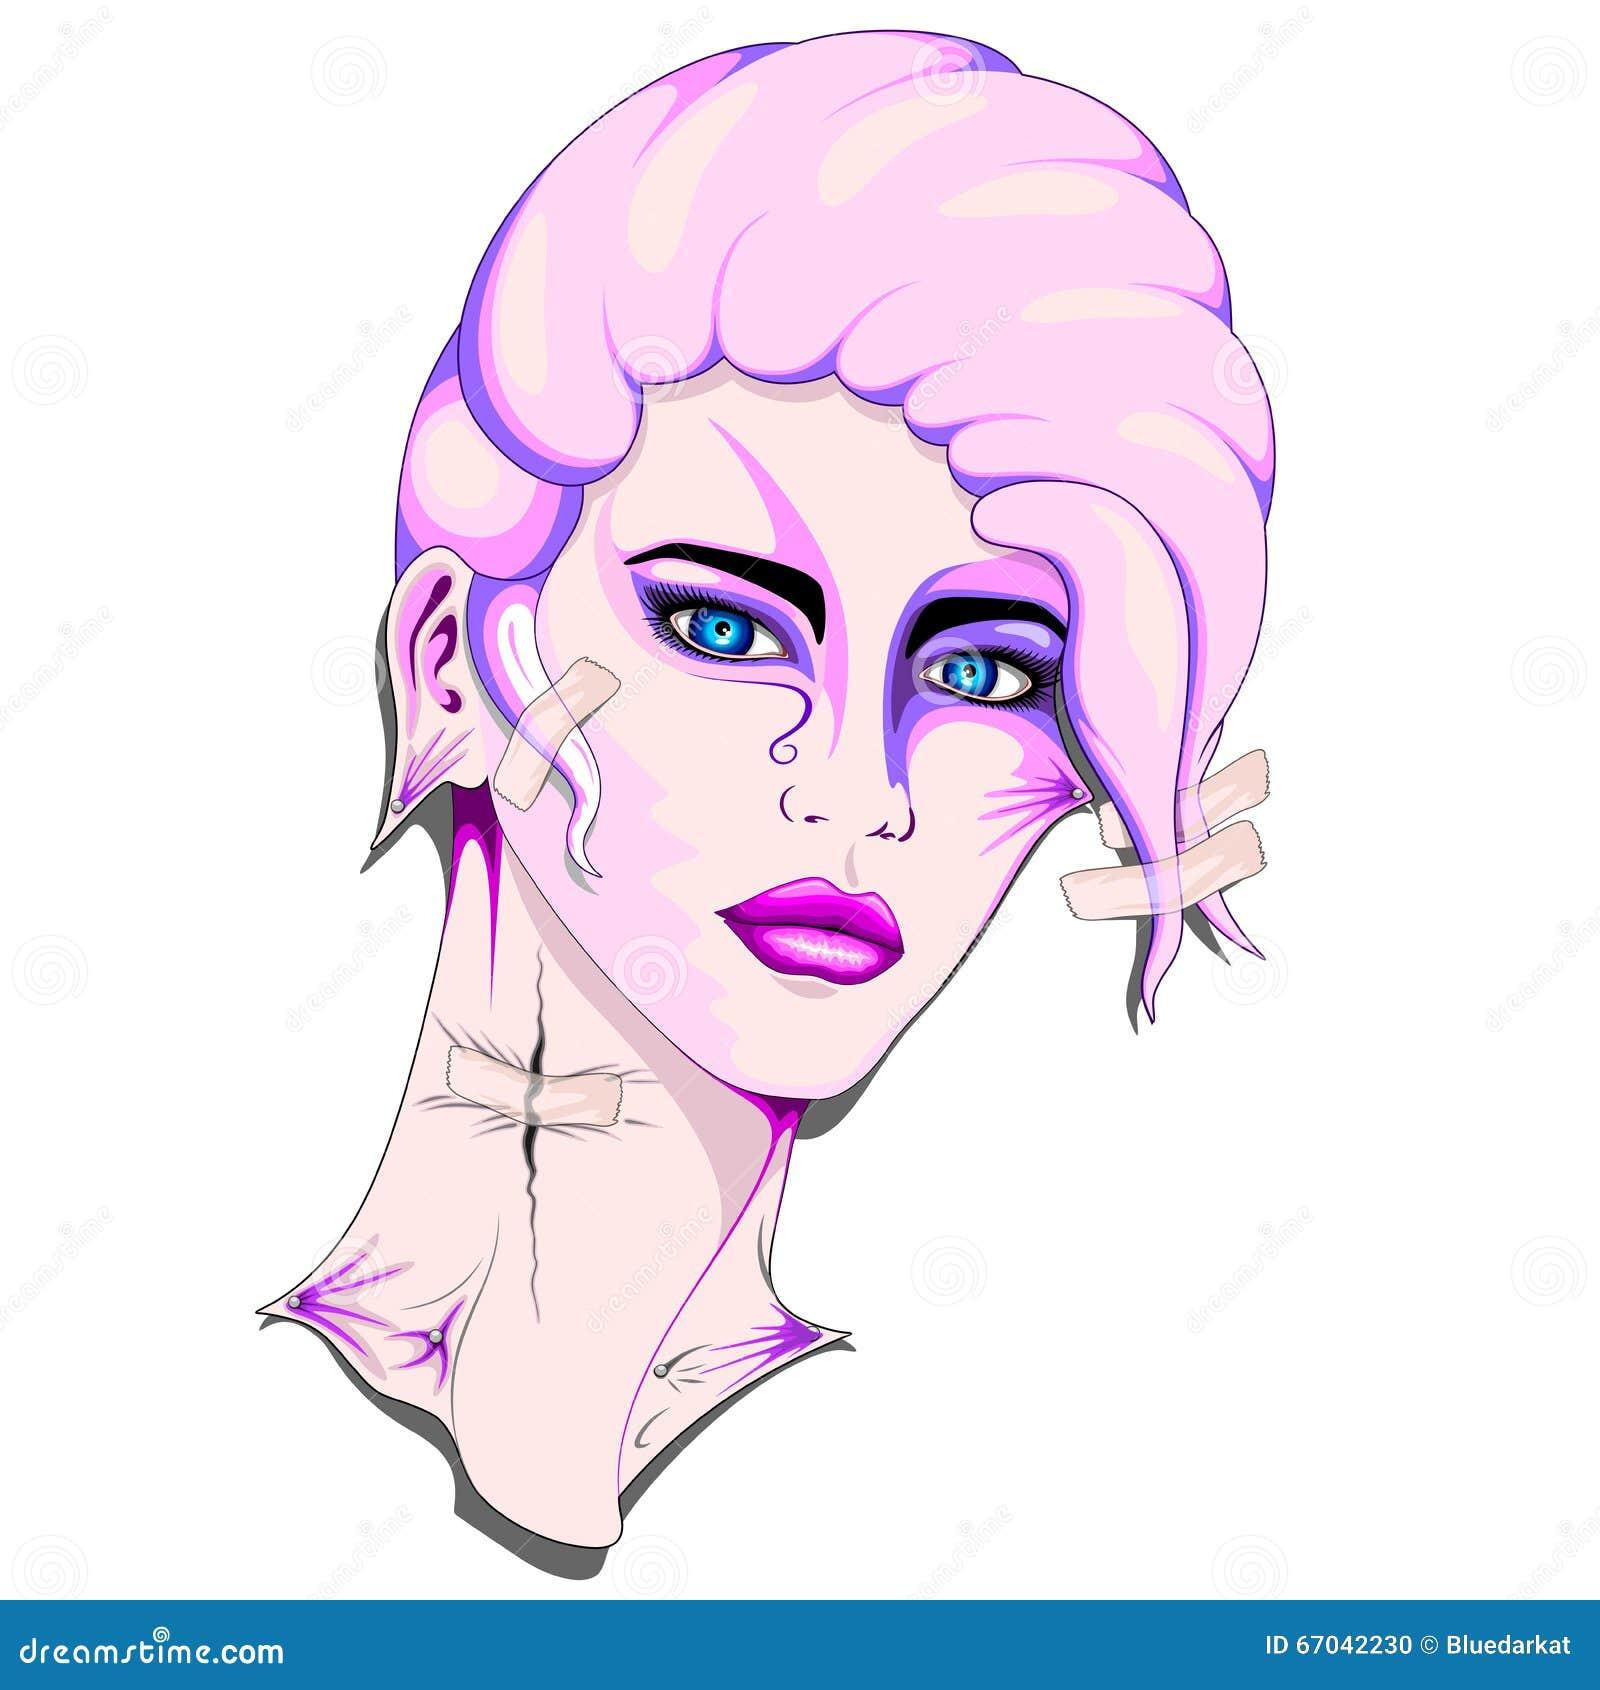 Pink Plastic Clone Girl